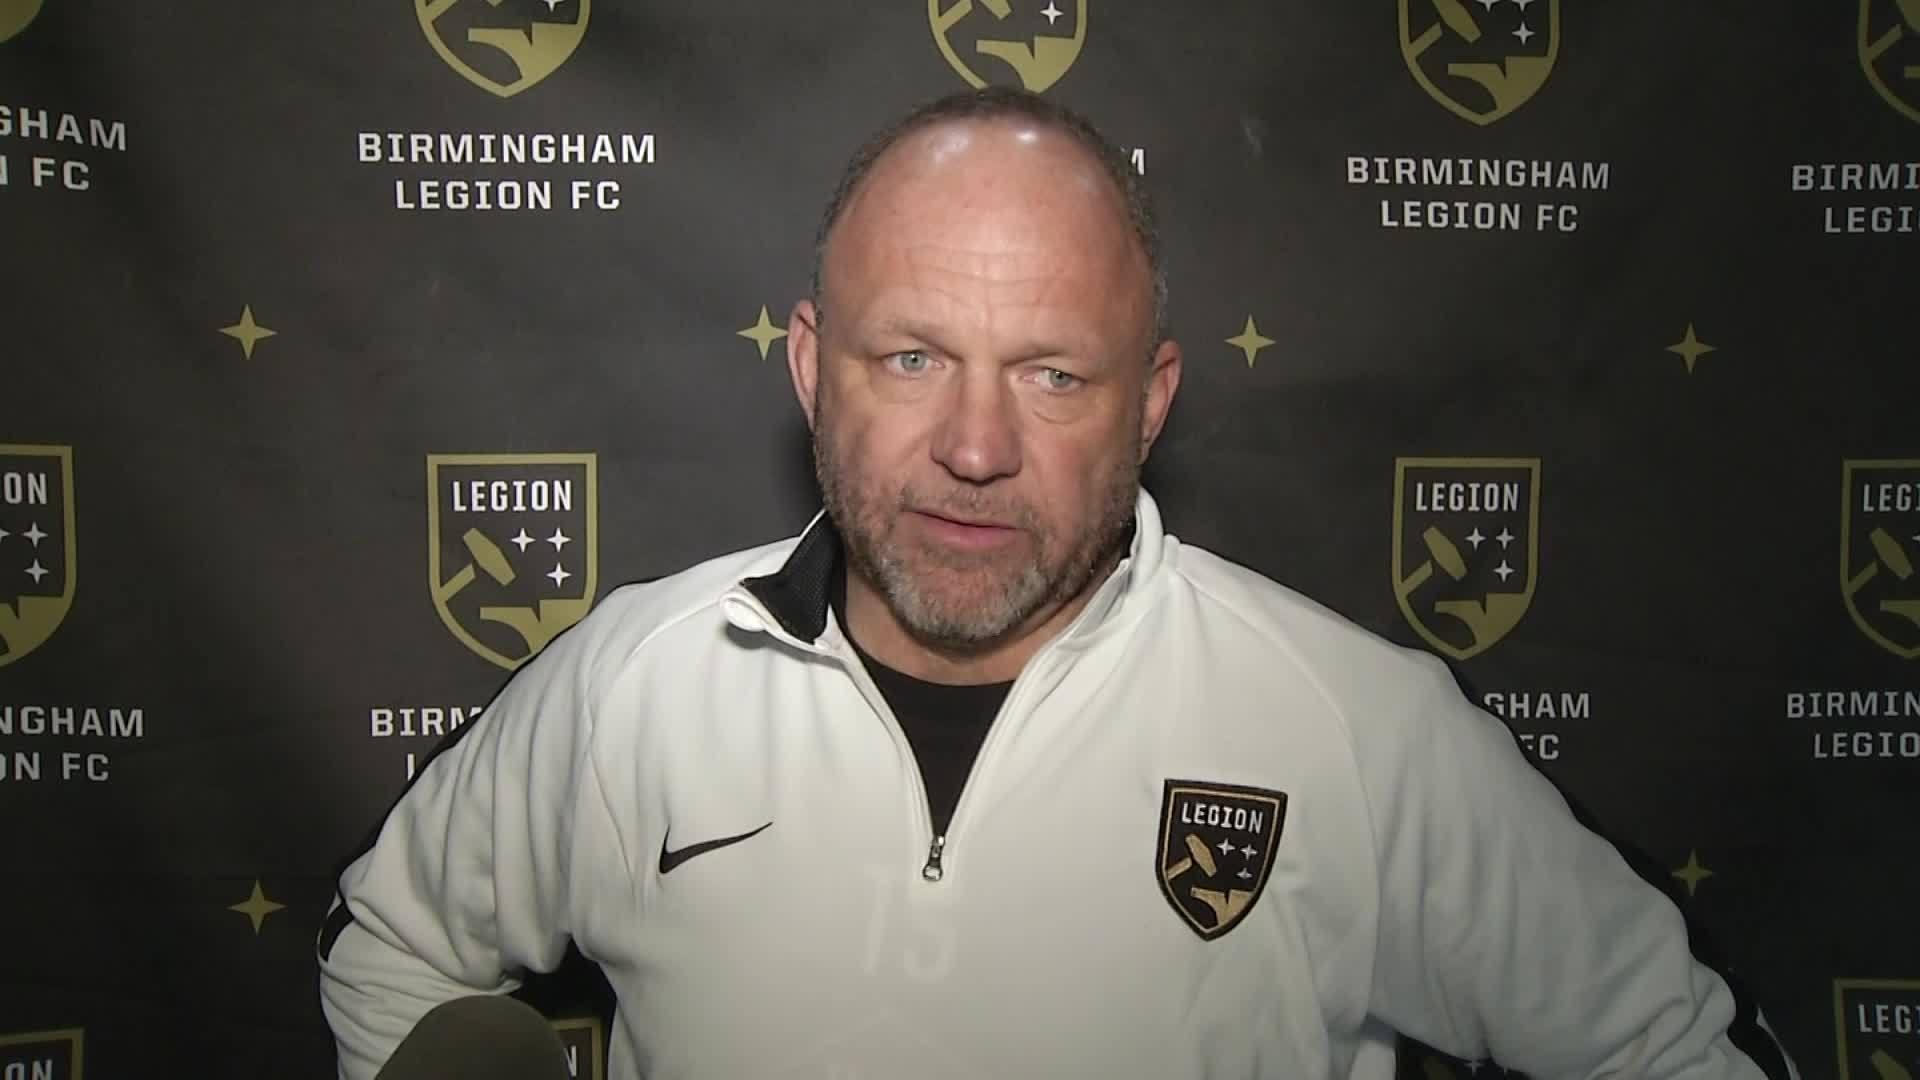 Birmingham's Pro Soccer Team- Birmingham Legion FC Opens Pre-Season Training Camp